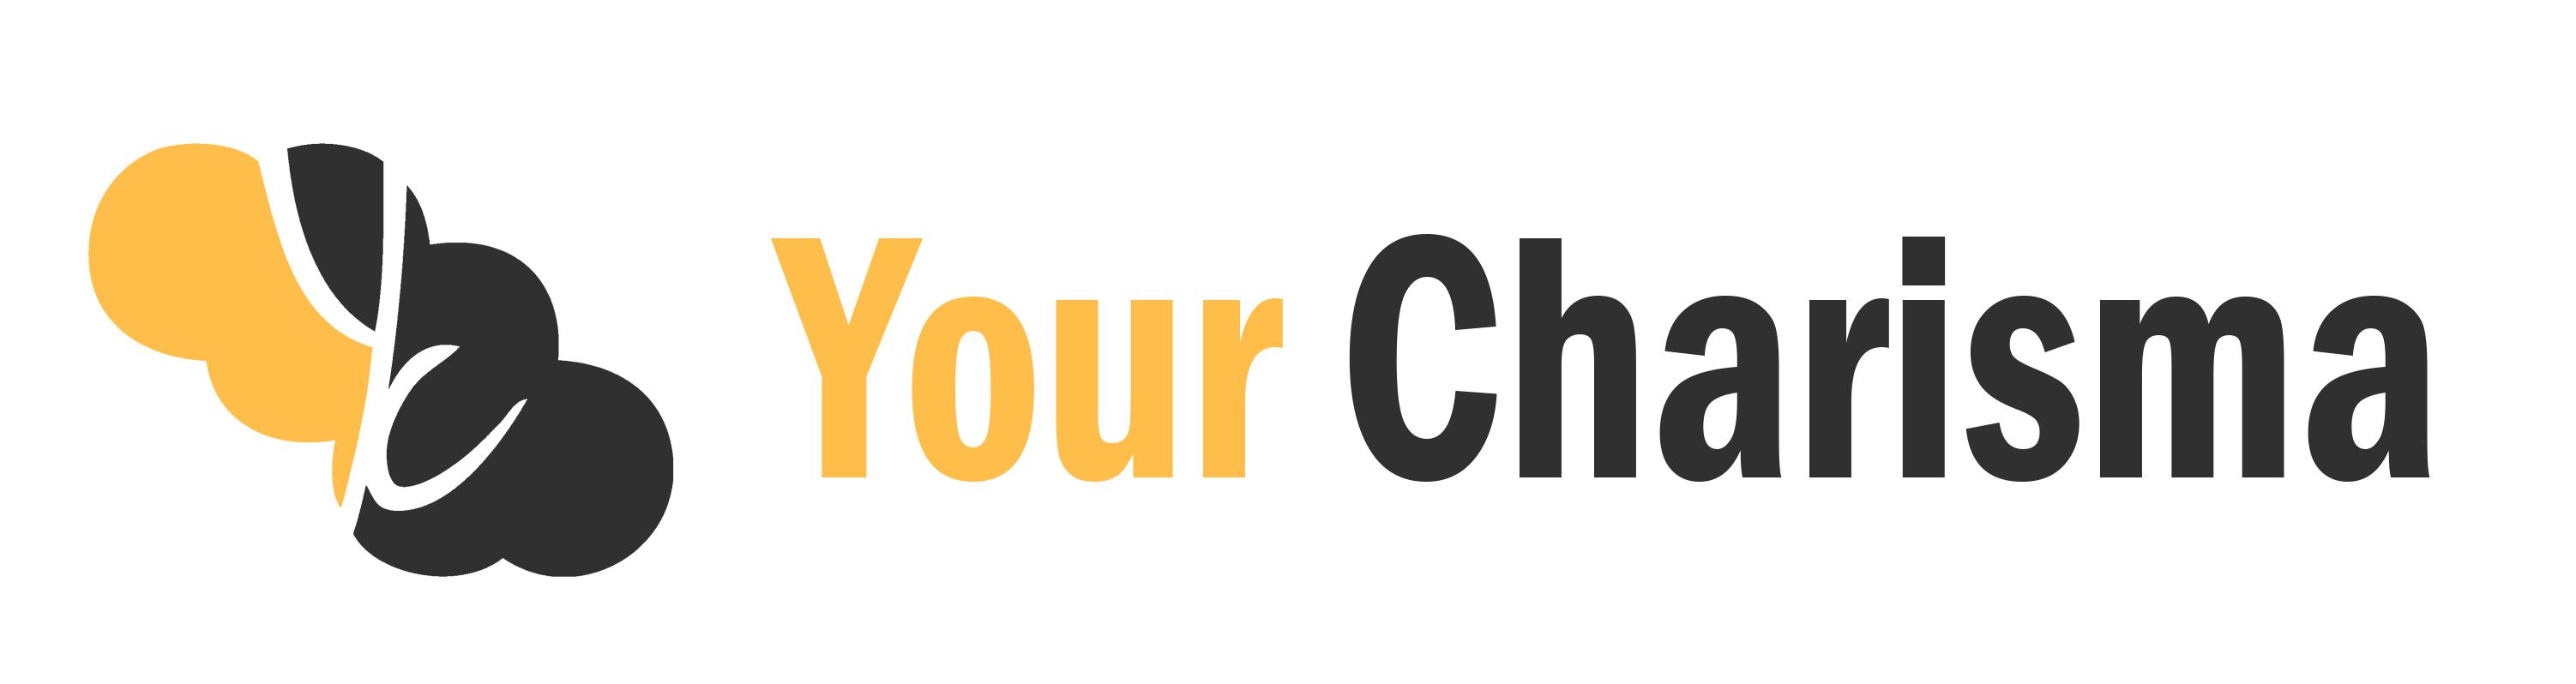 Your Charisma | Social Media Consultancy